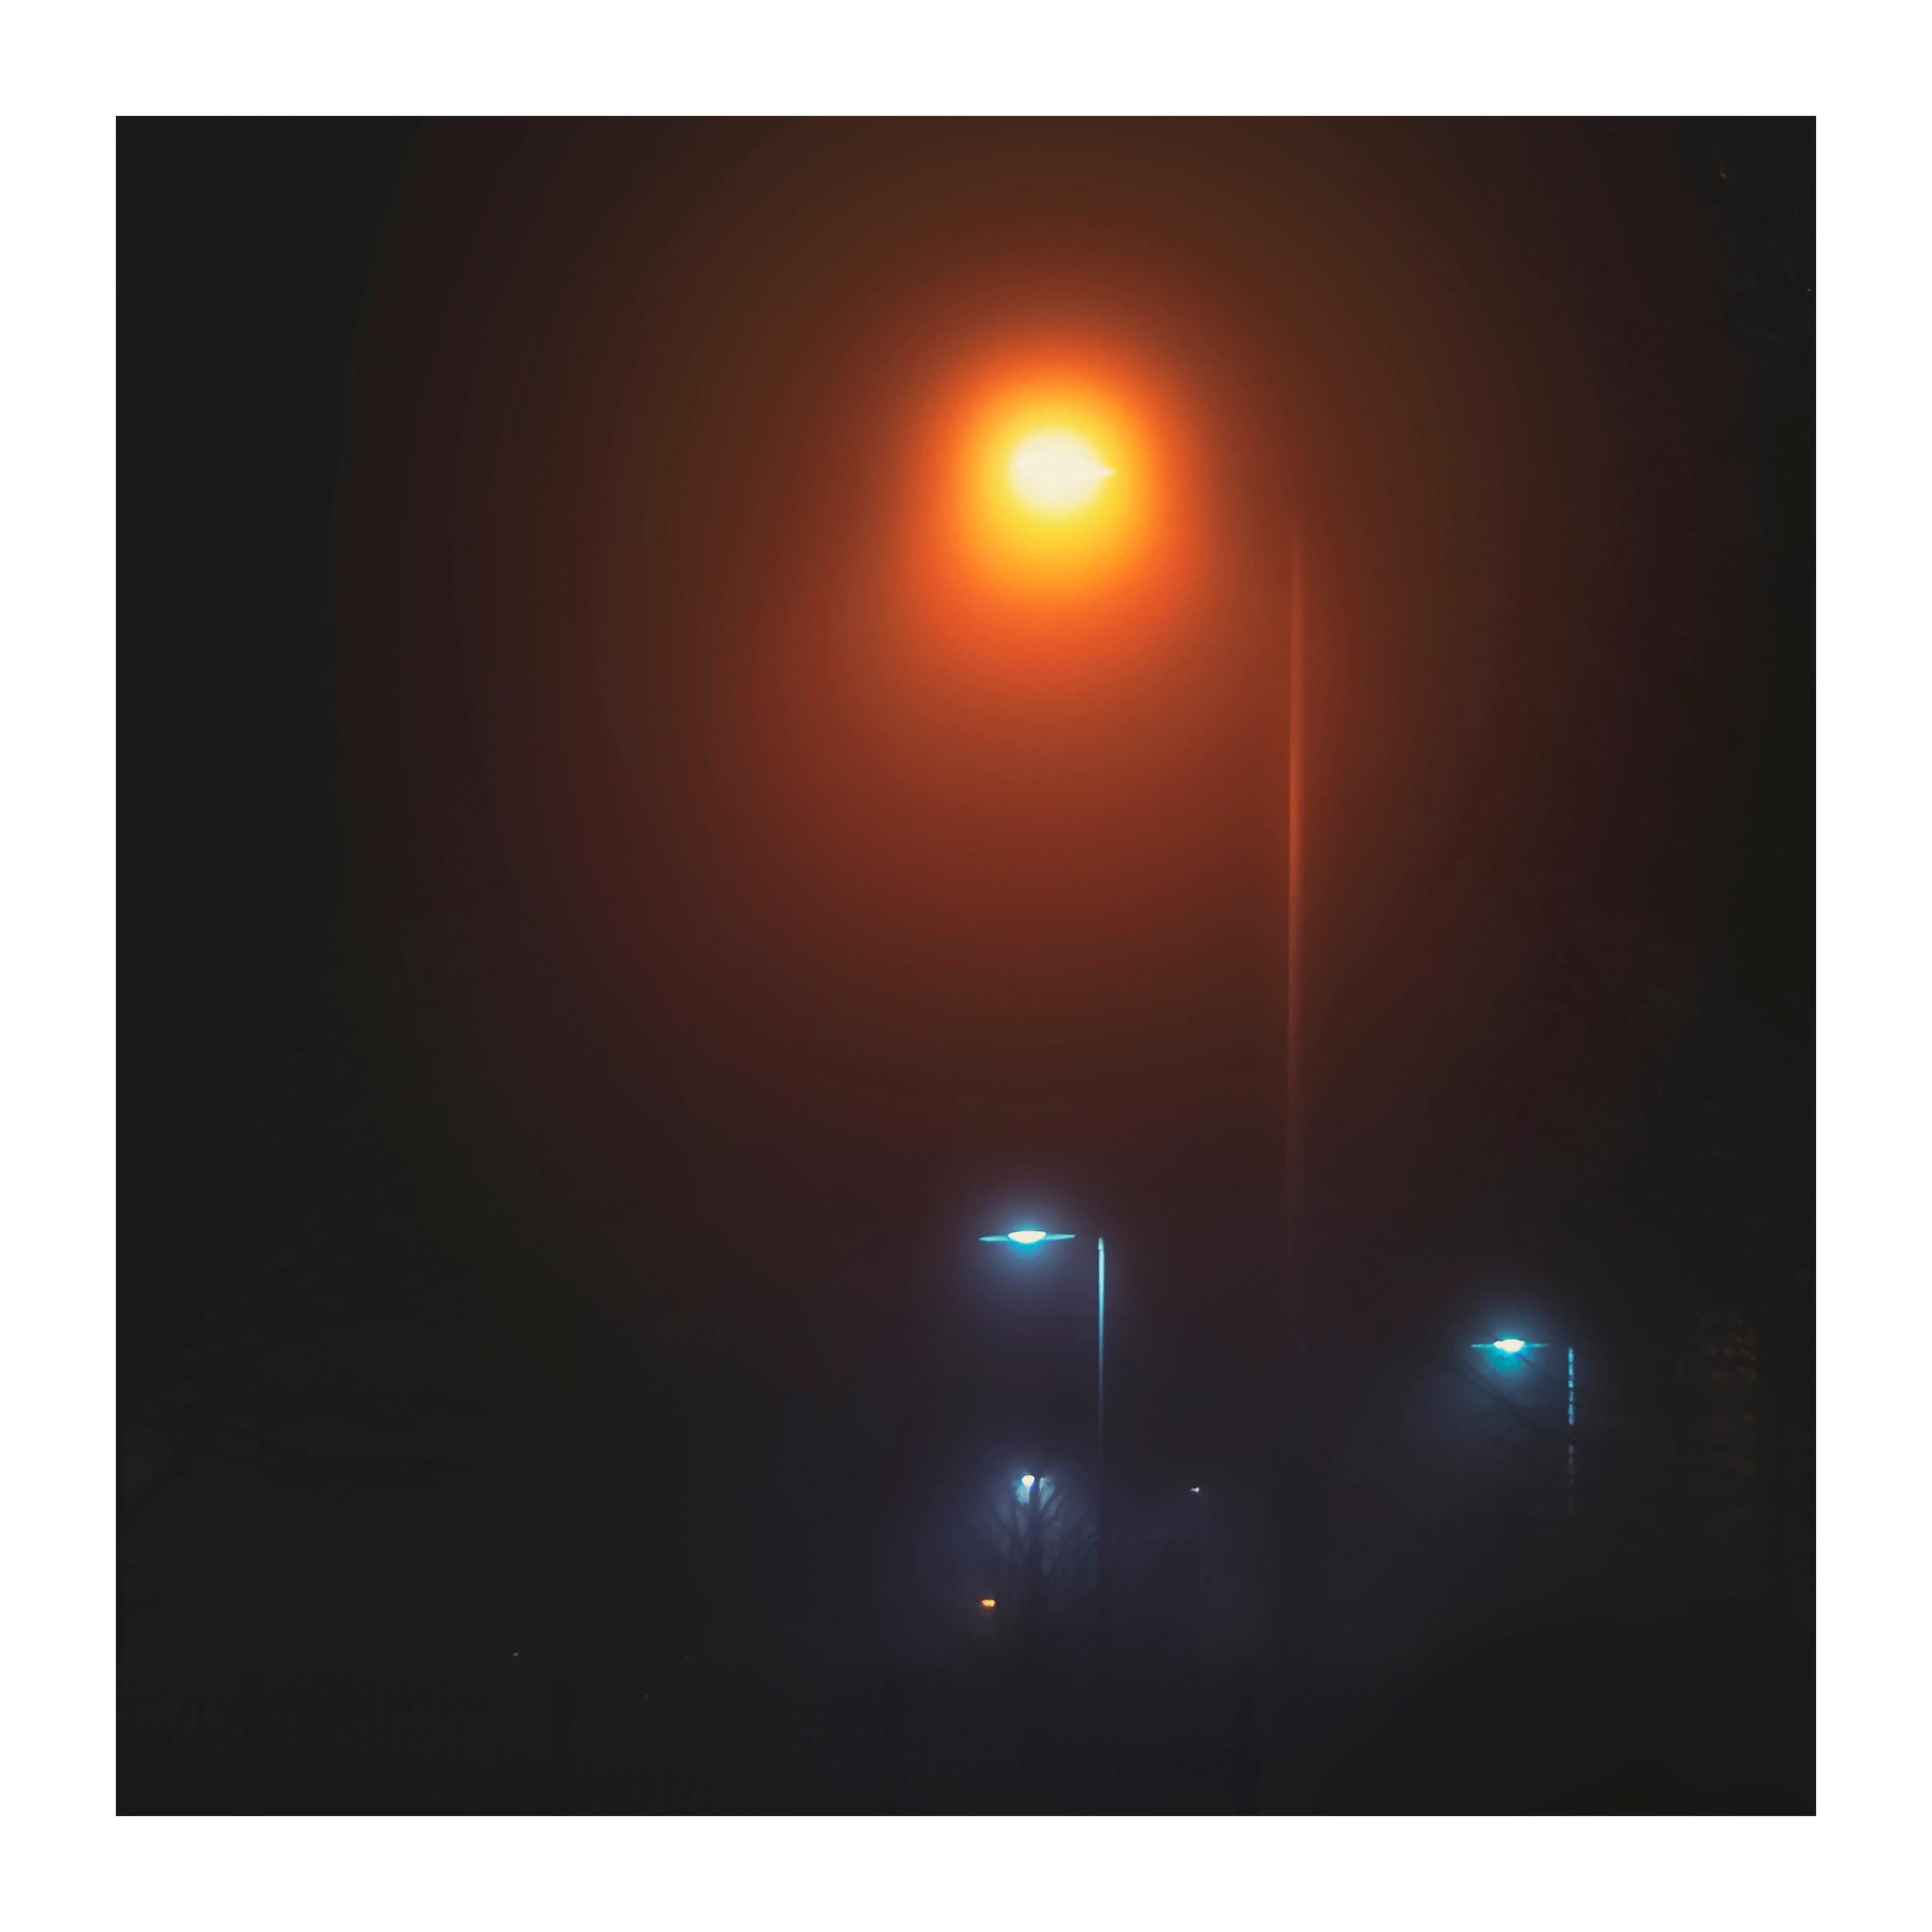 Nonlinear Abandonment 4 - photography - fivetimesno | ello